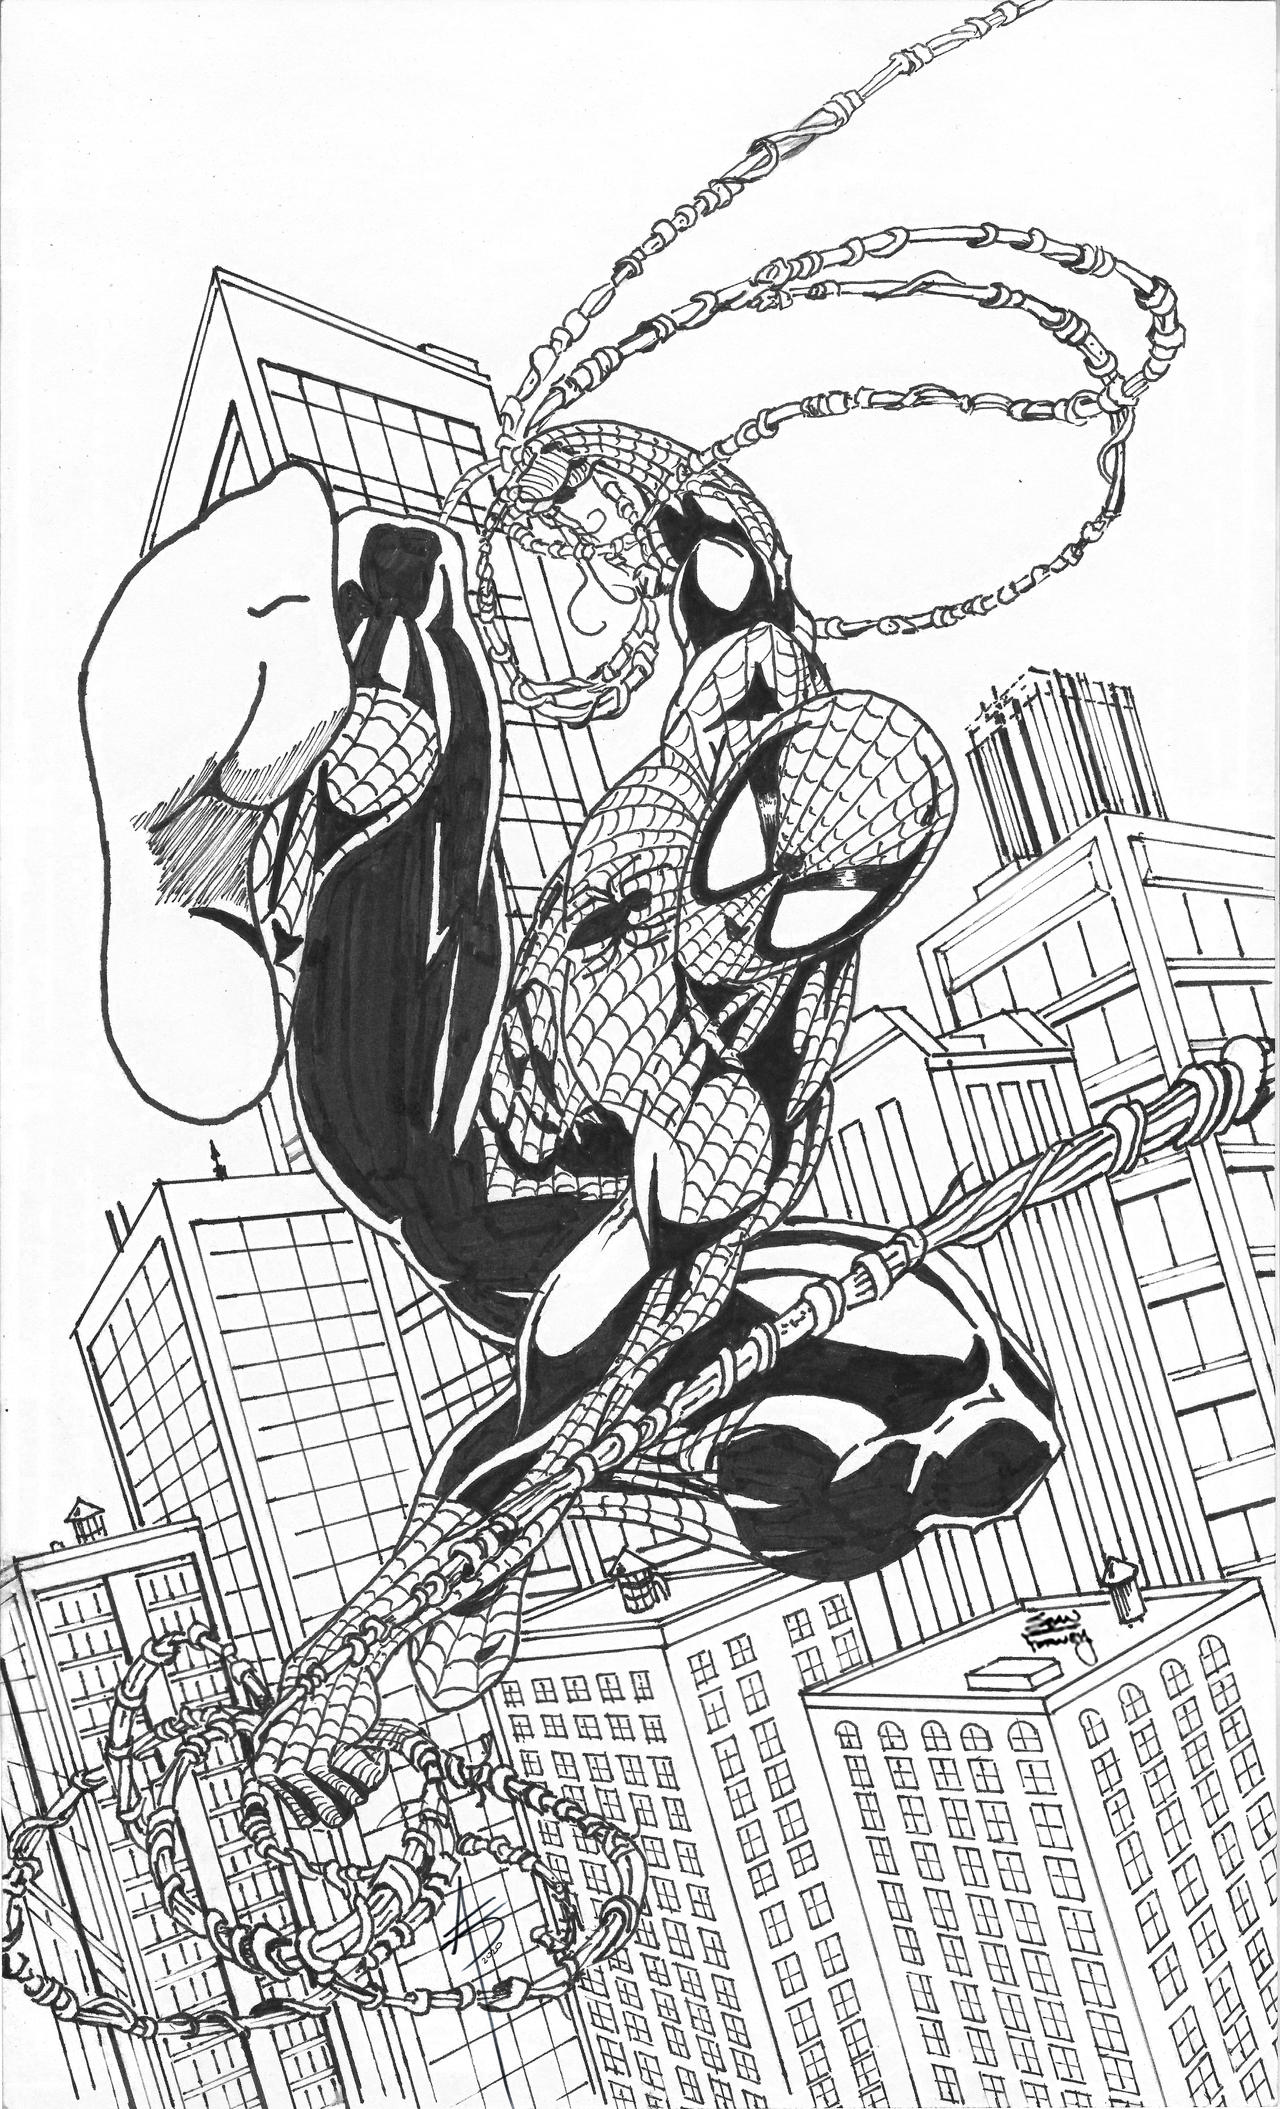 SPIDERMAN Swinging in the big city